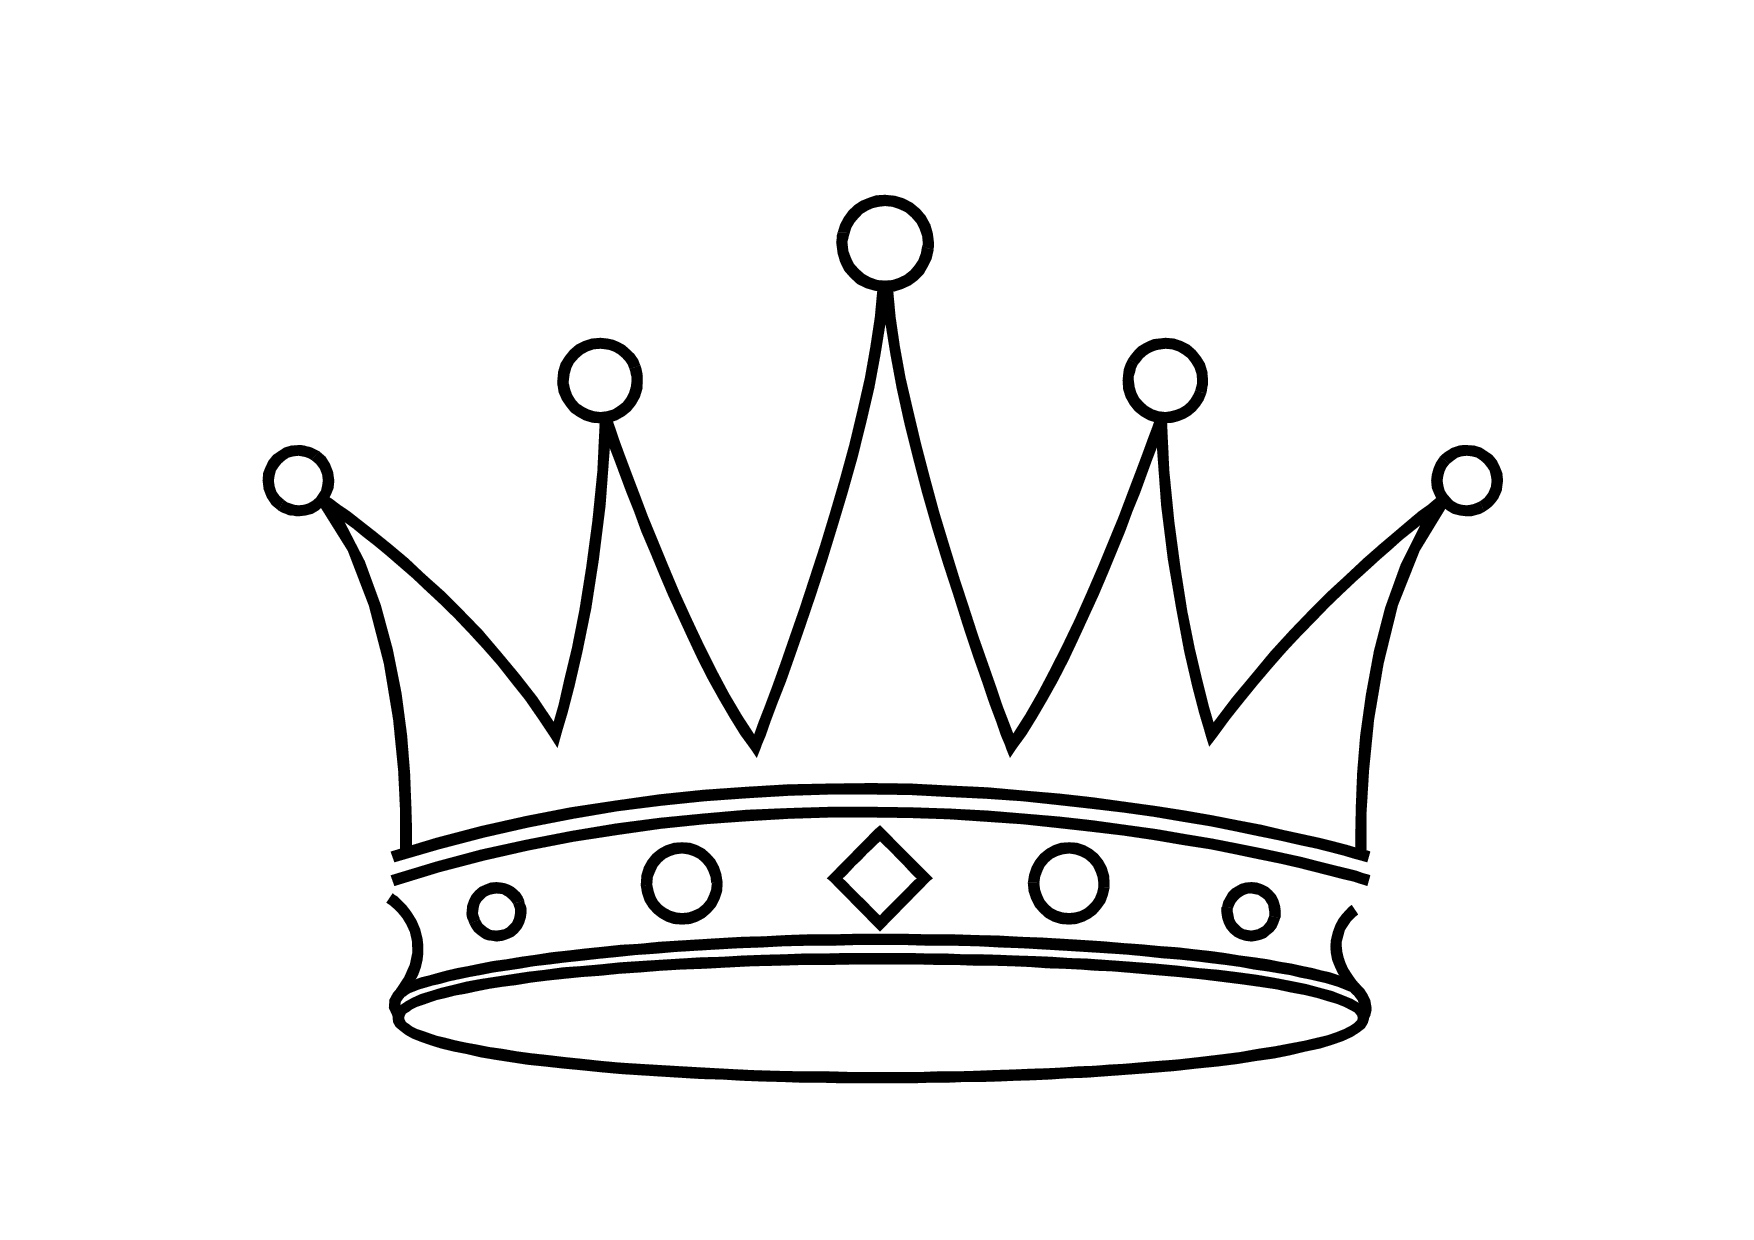 Coloring book princess crowns - Black Princess Crown Clipart Clipart Panda Free Clipart Images